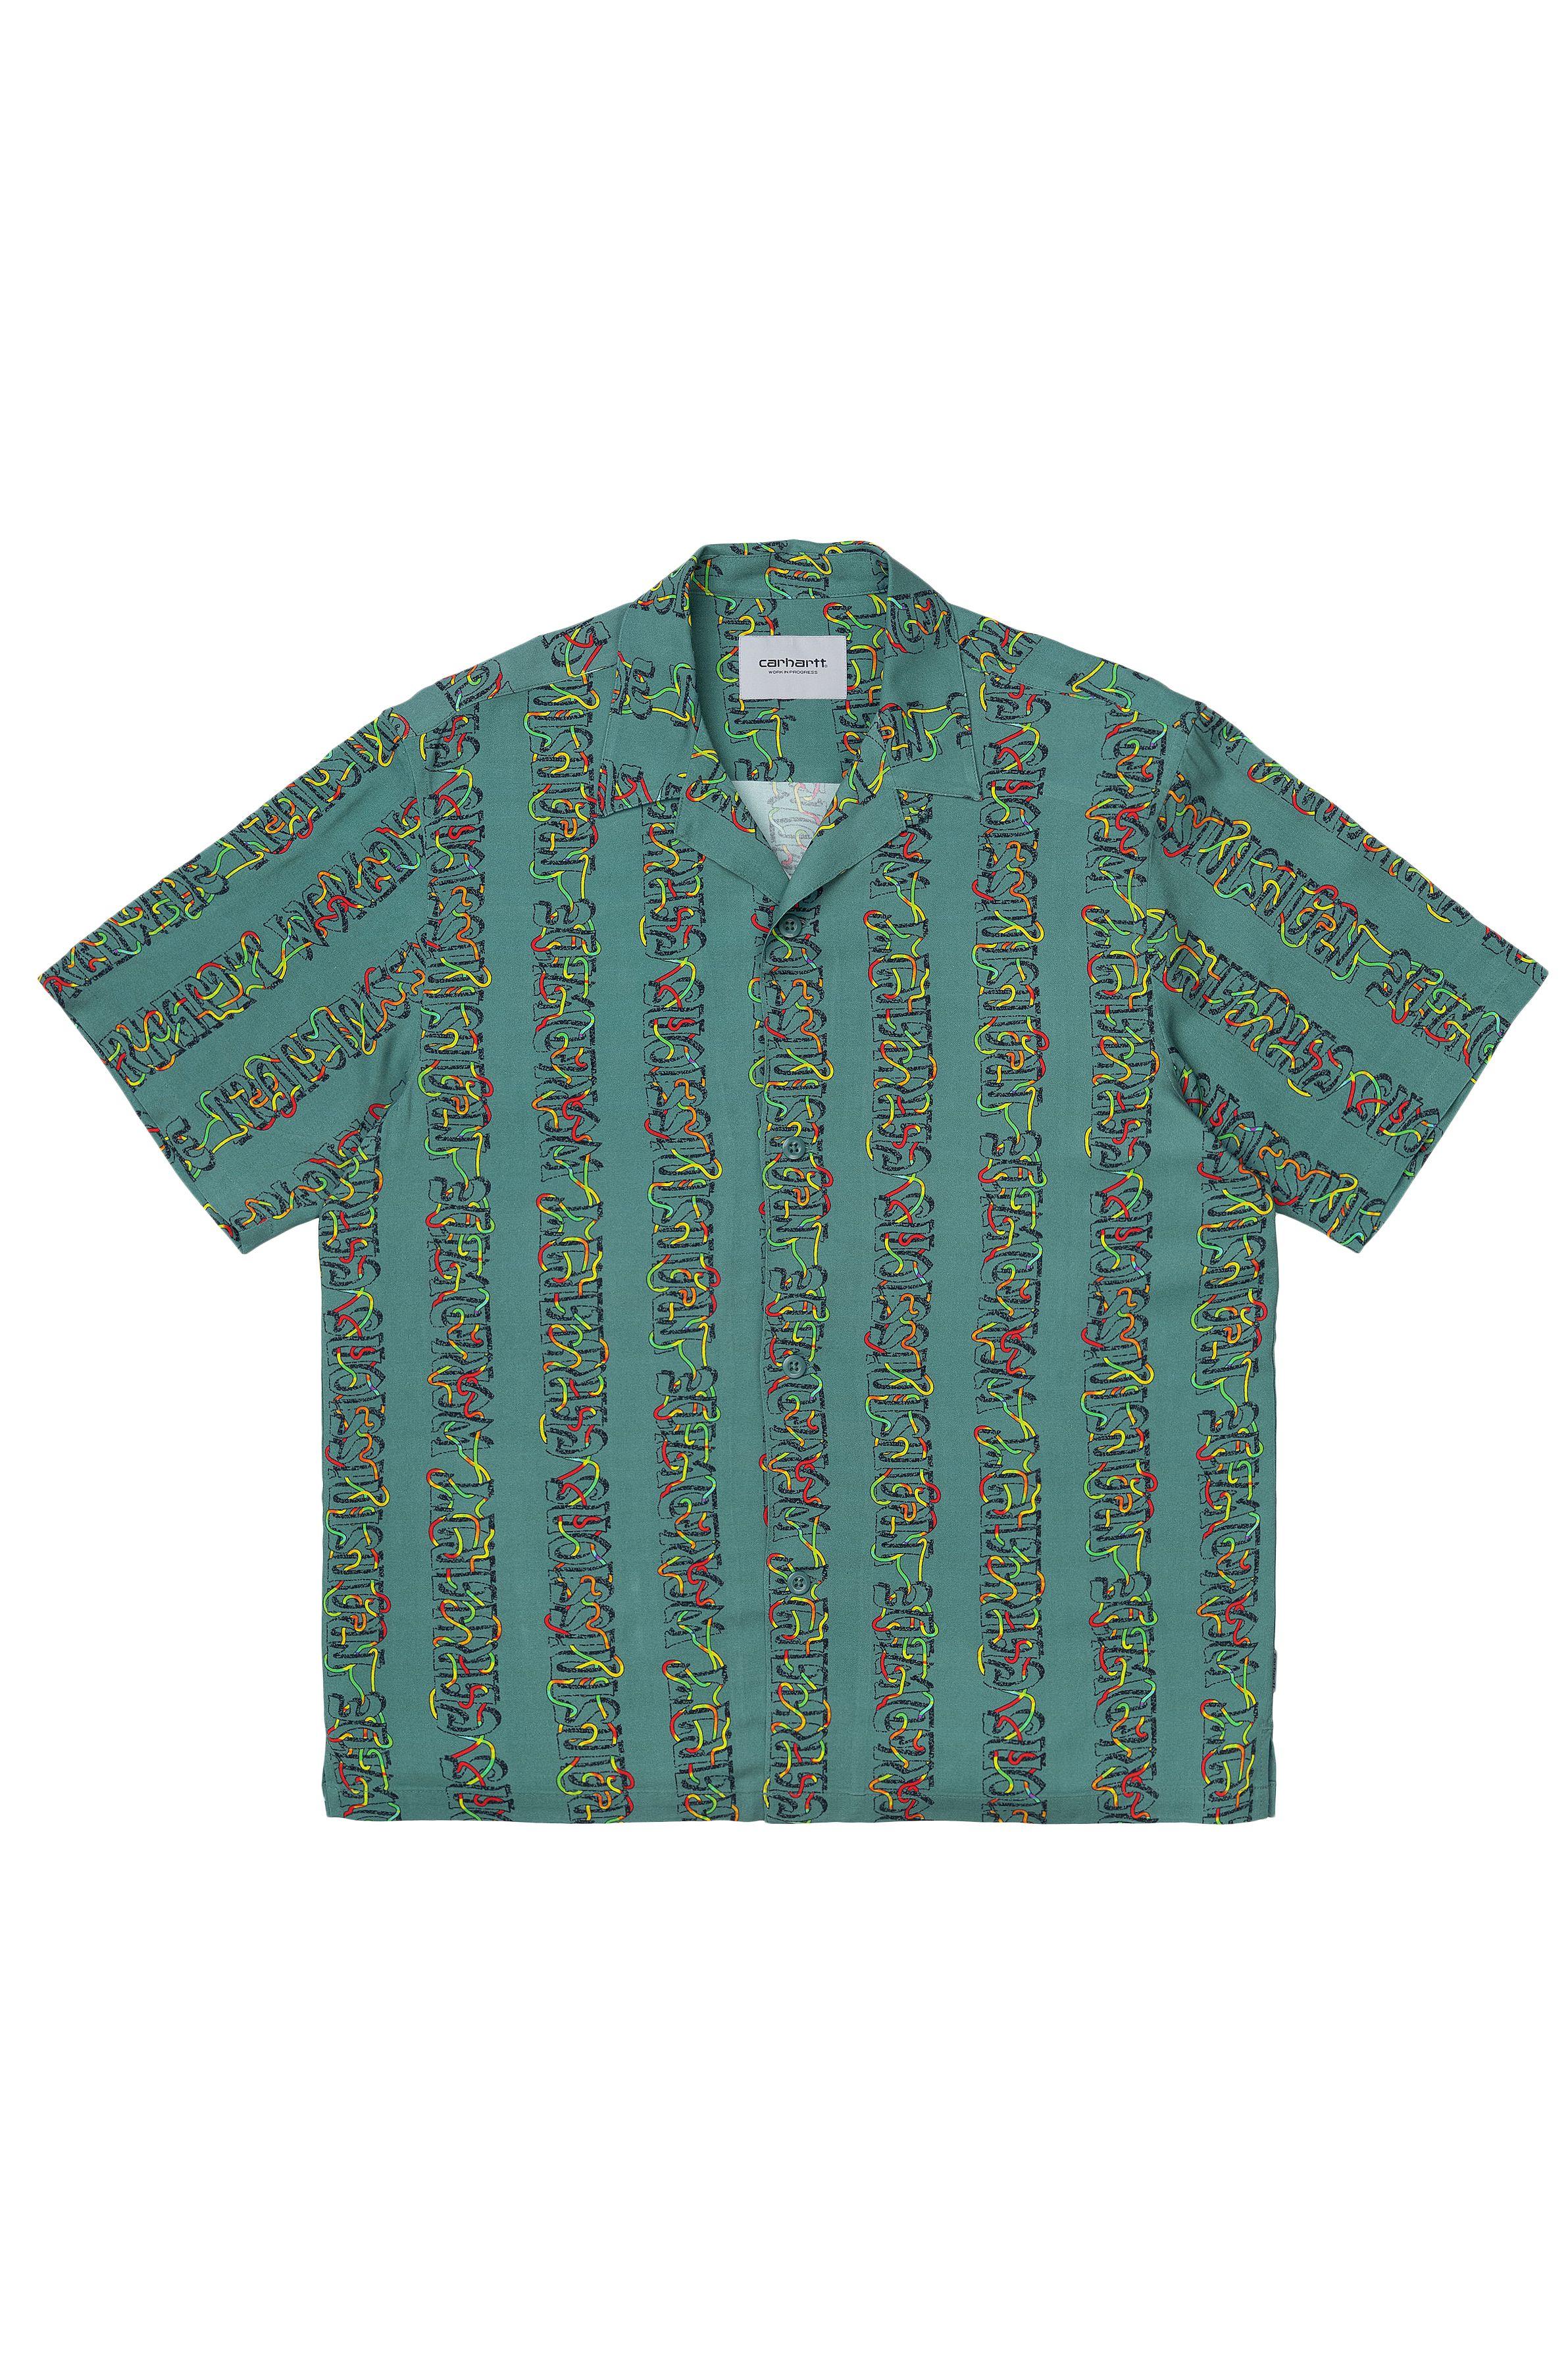 Carhartt WIP Shirt S/S TRANSMISSION SHIRT Transmission Print, Hydro